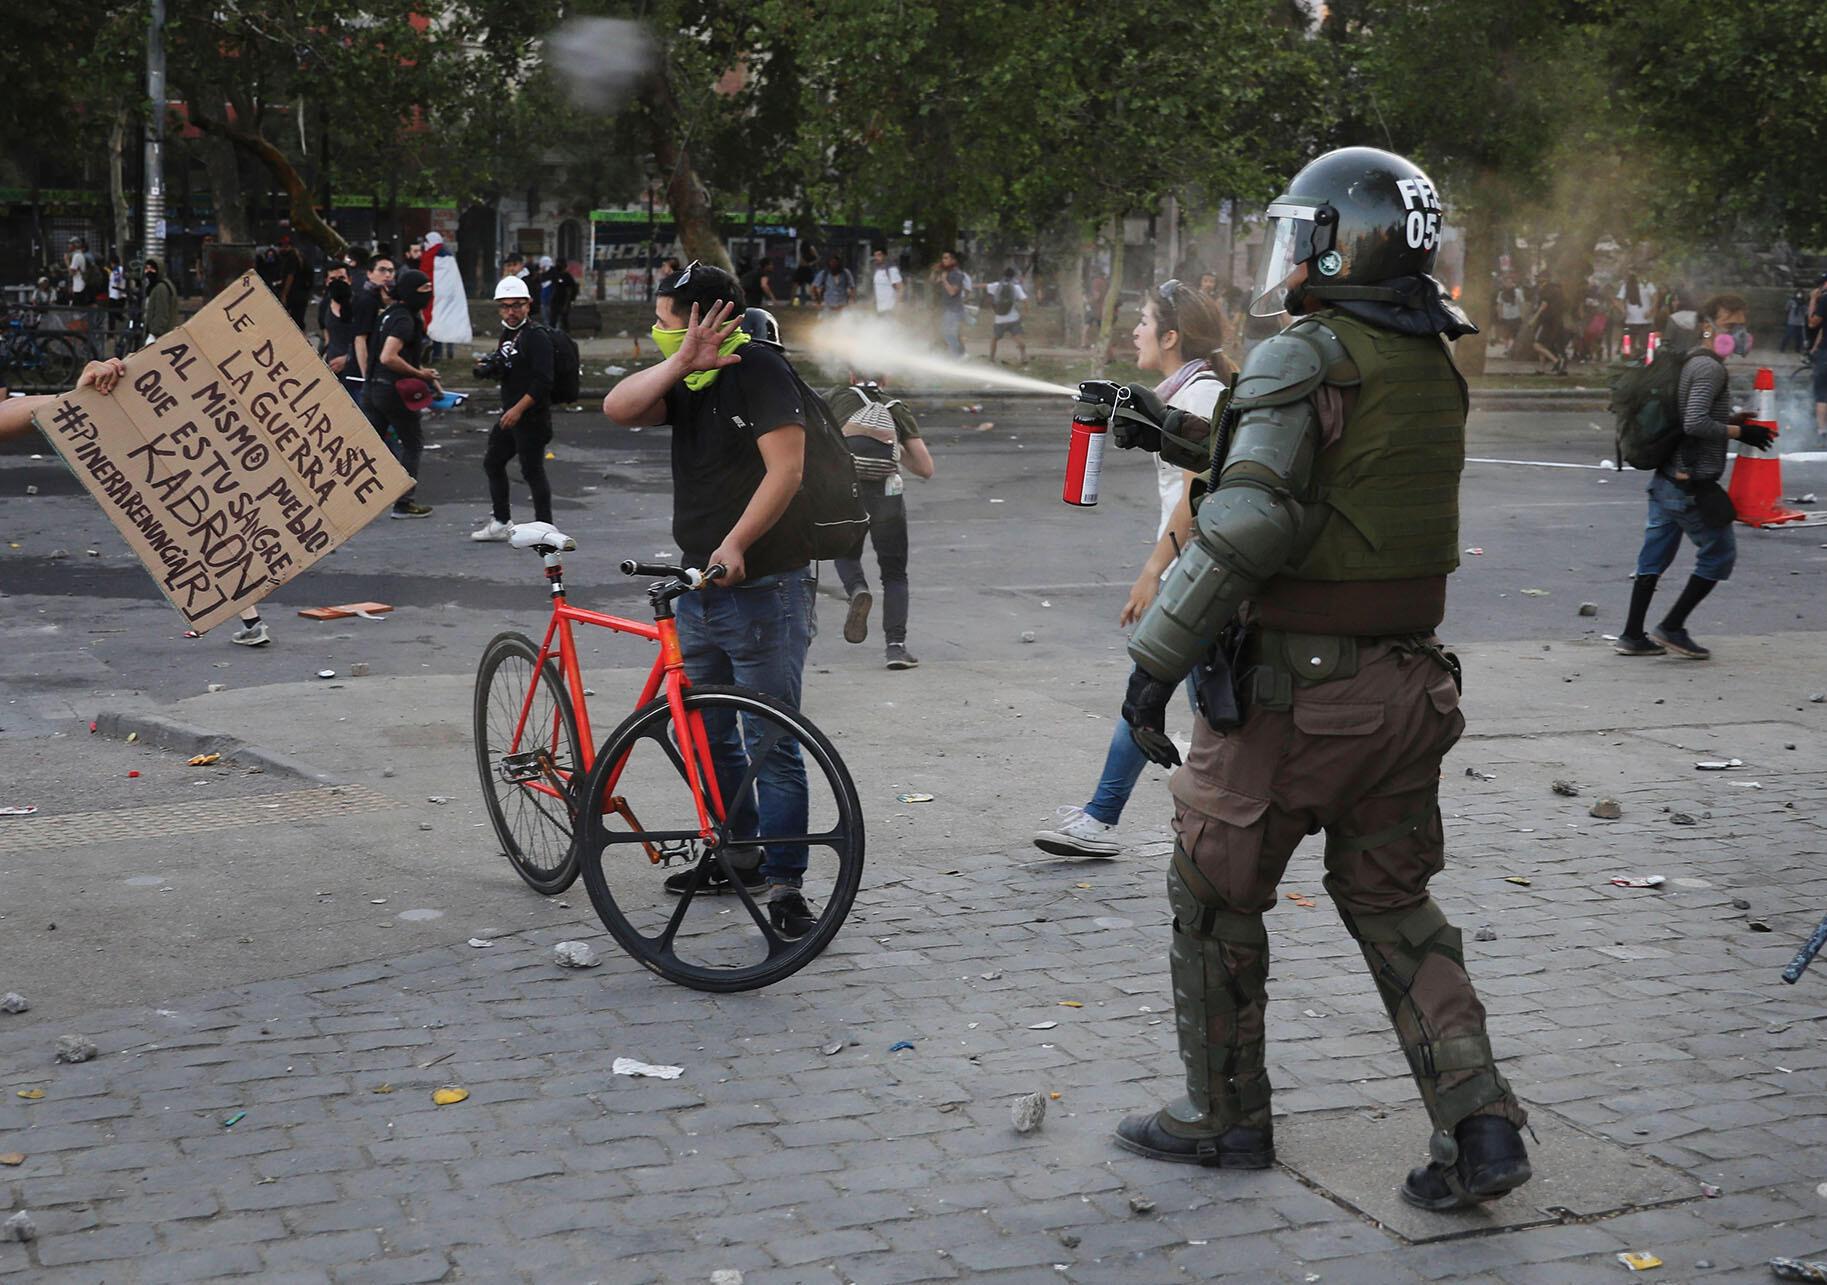 A Chilean carabinero pepper-sprays a demonstrator in Santiago, October 2019. (Photo by Rodrigo Abd/AP Photo.)